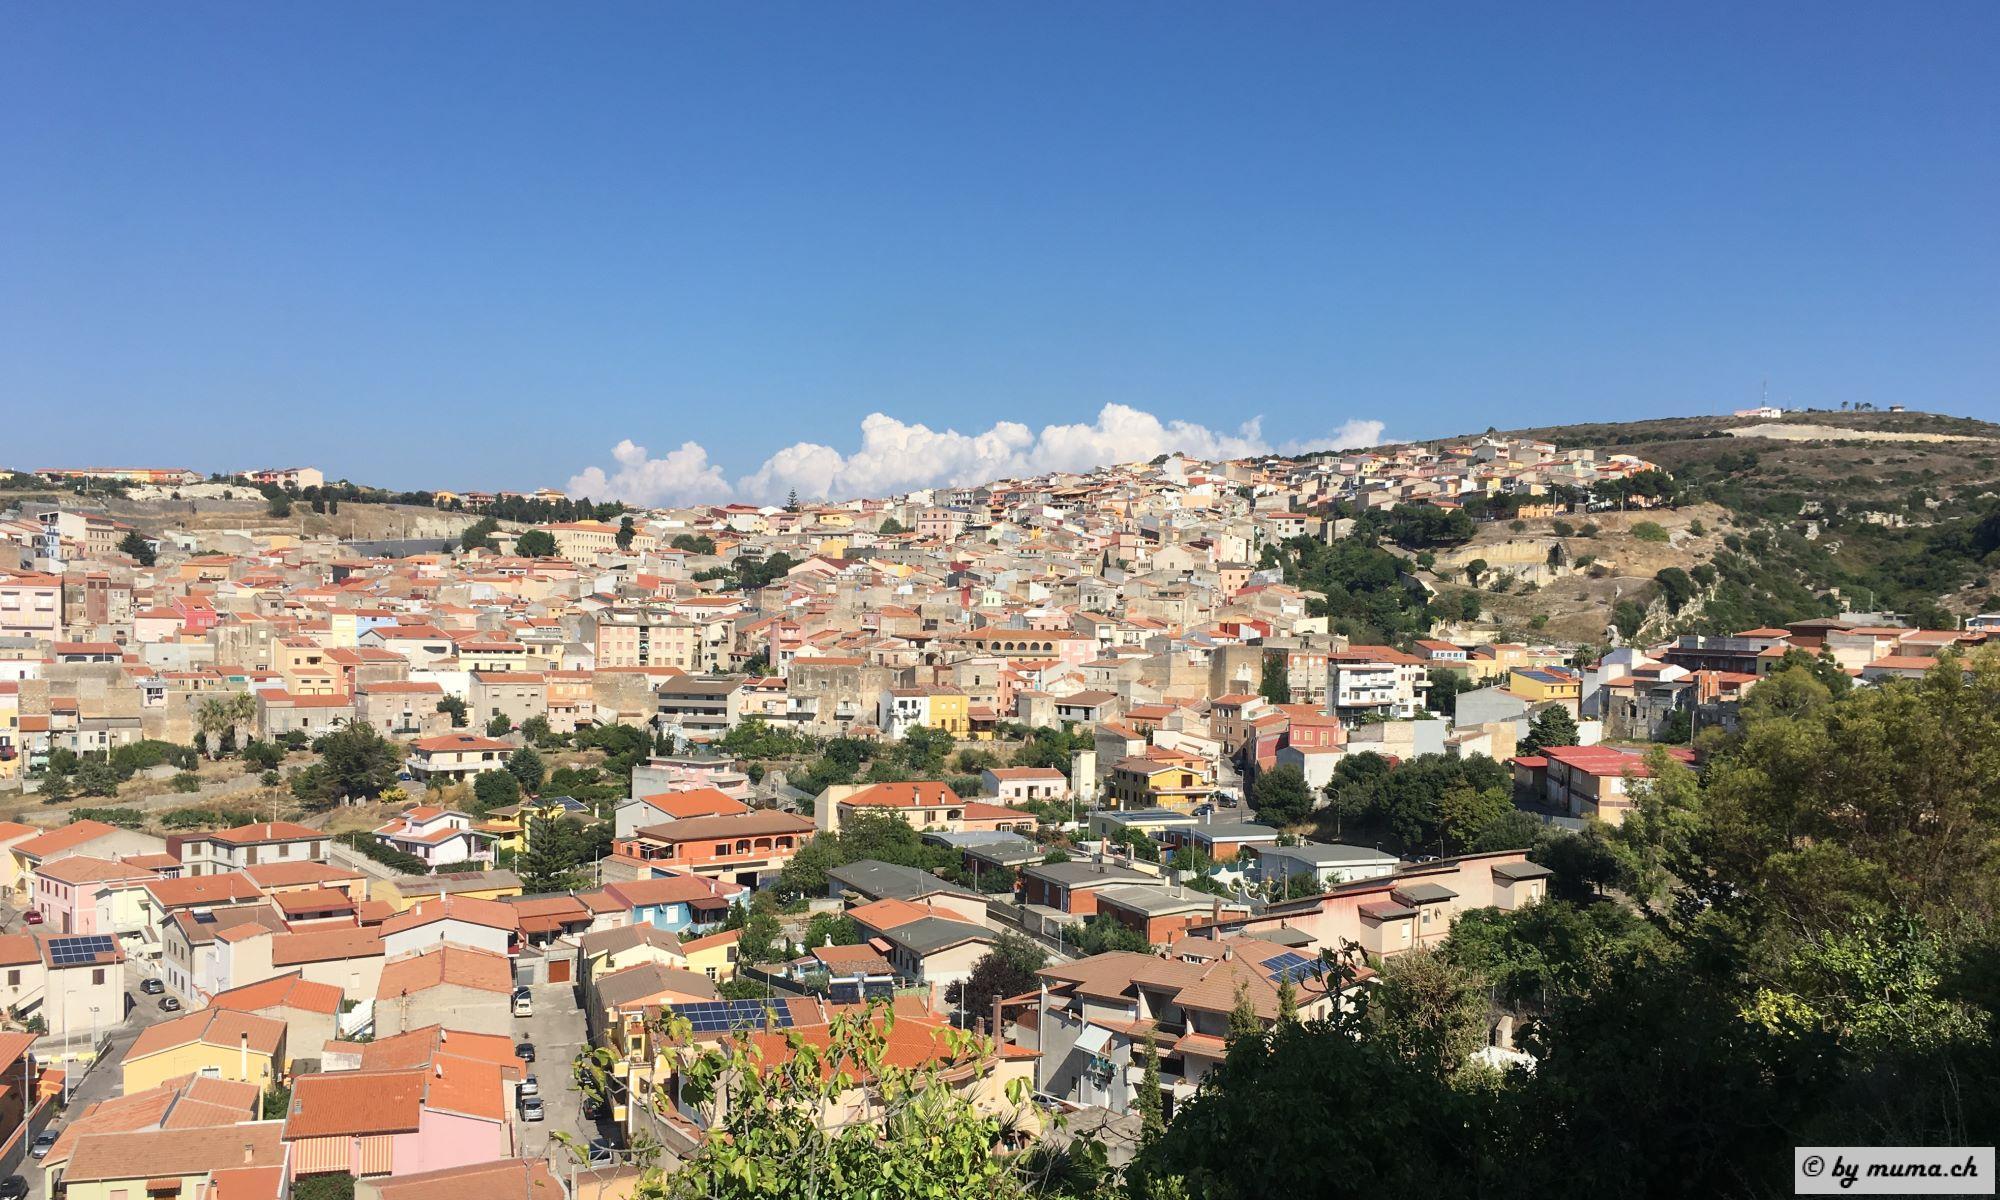 Reith's Reiseblog